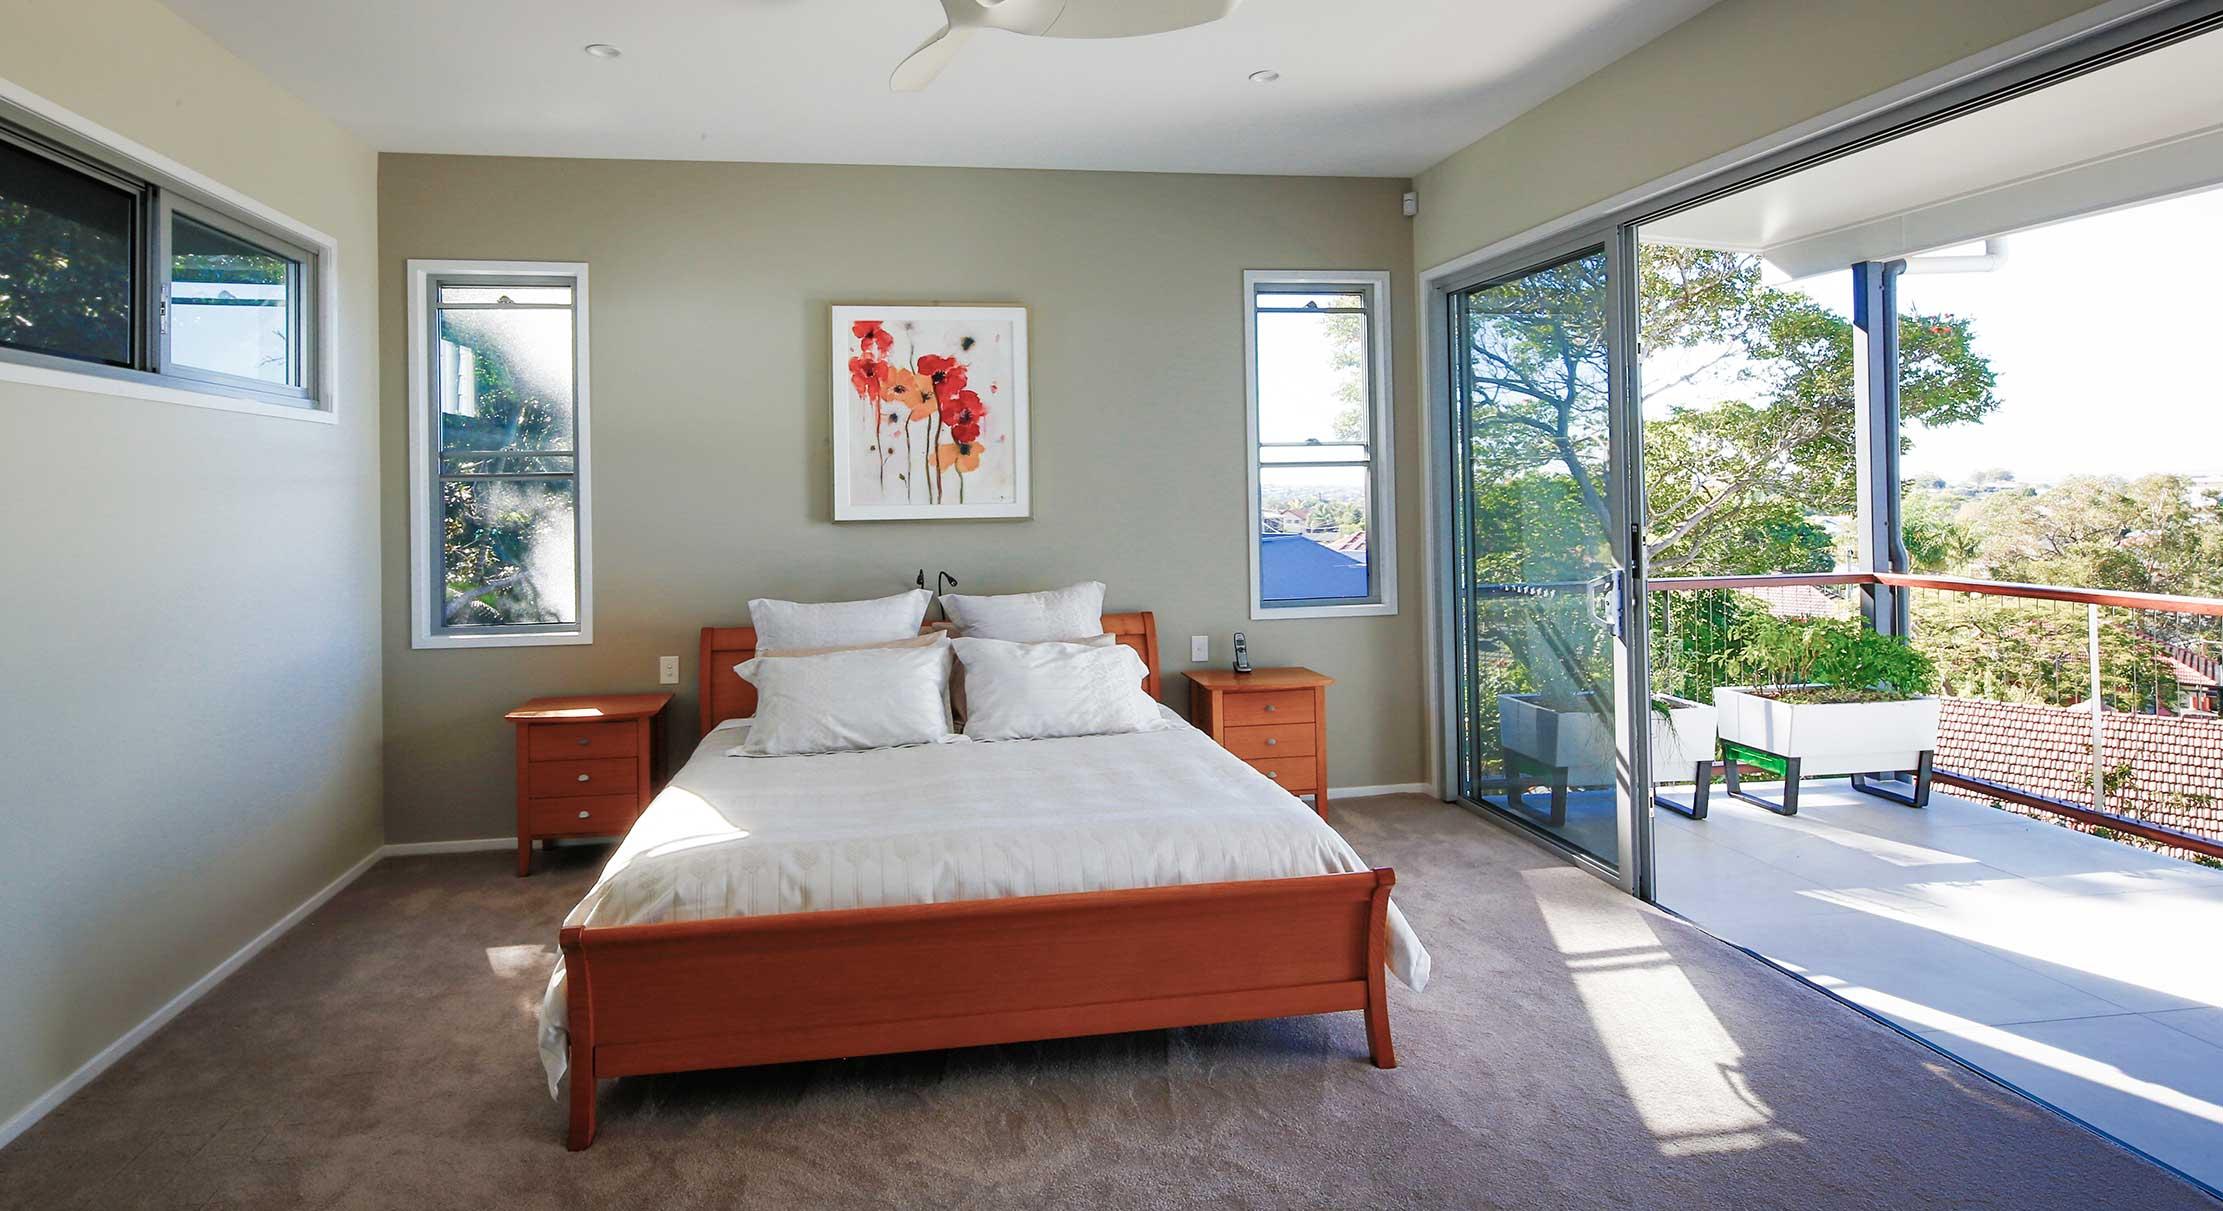 portfolio-3-slider-image-2-bedroom-stafford-gary-cramb-constructions-brisbane